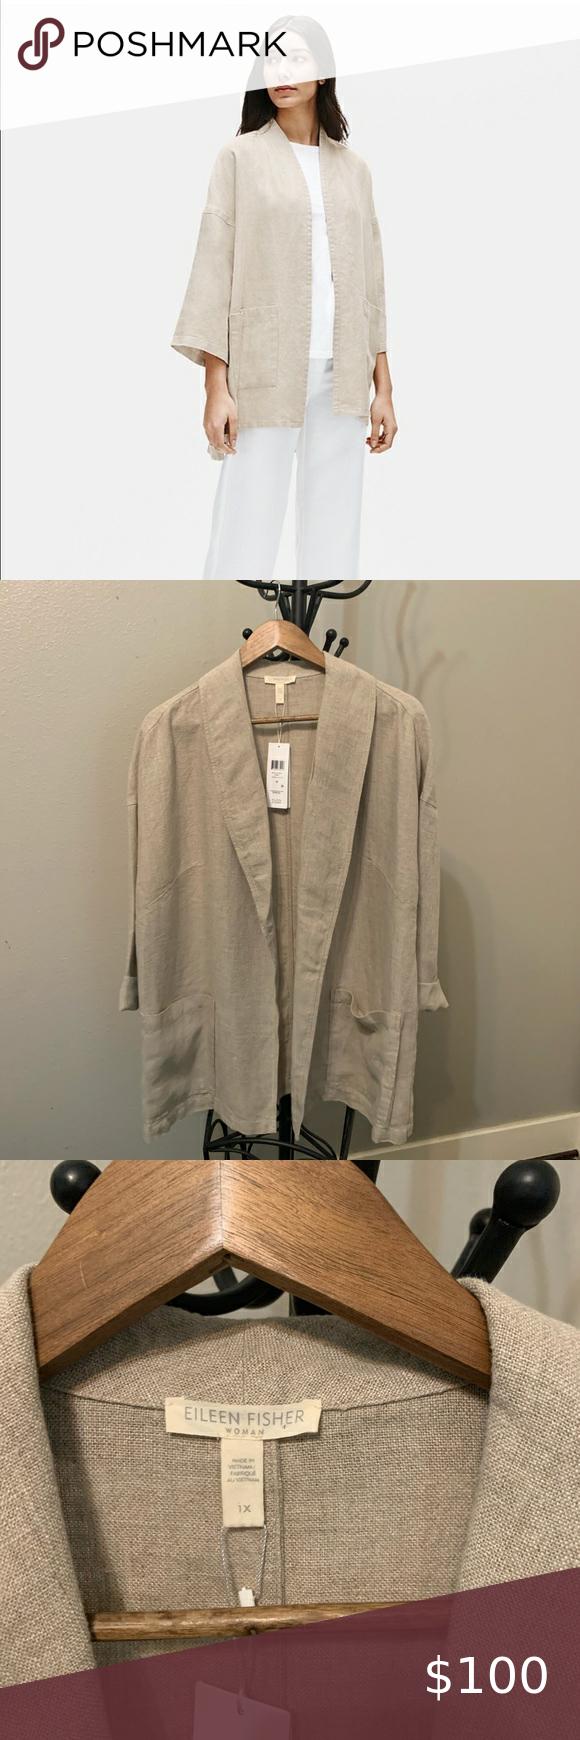 Eileen Fisher 1x 2x Heavy Organic Linen Jacket Linen Jackets Organic Linens Eileen Fisher Jacket [ 1740 x 580 Pixel ]